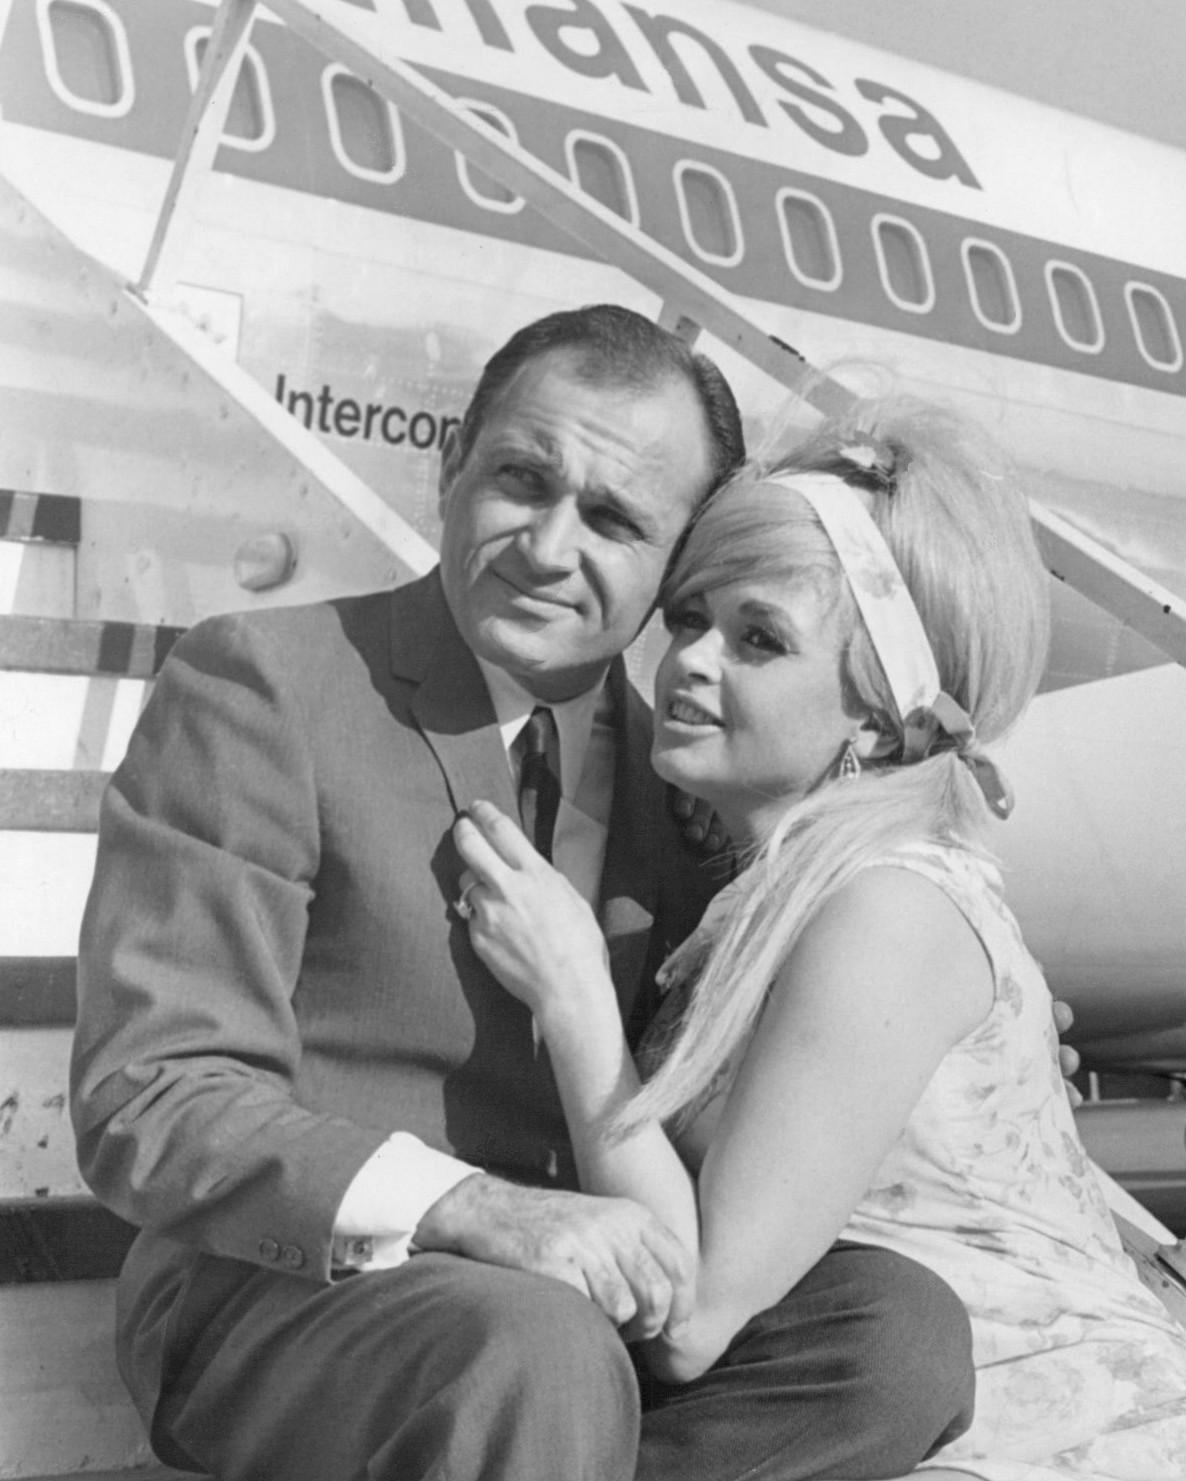 File:Jayne Mansfield and Sam Brody May 1967.jpg - Wikimedia Commons